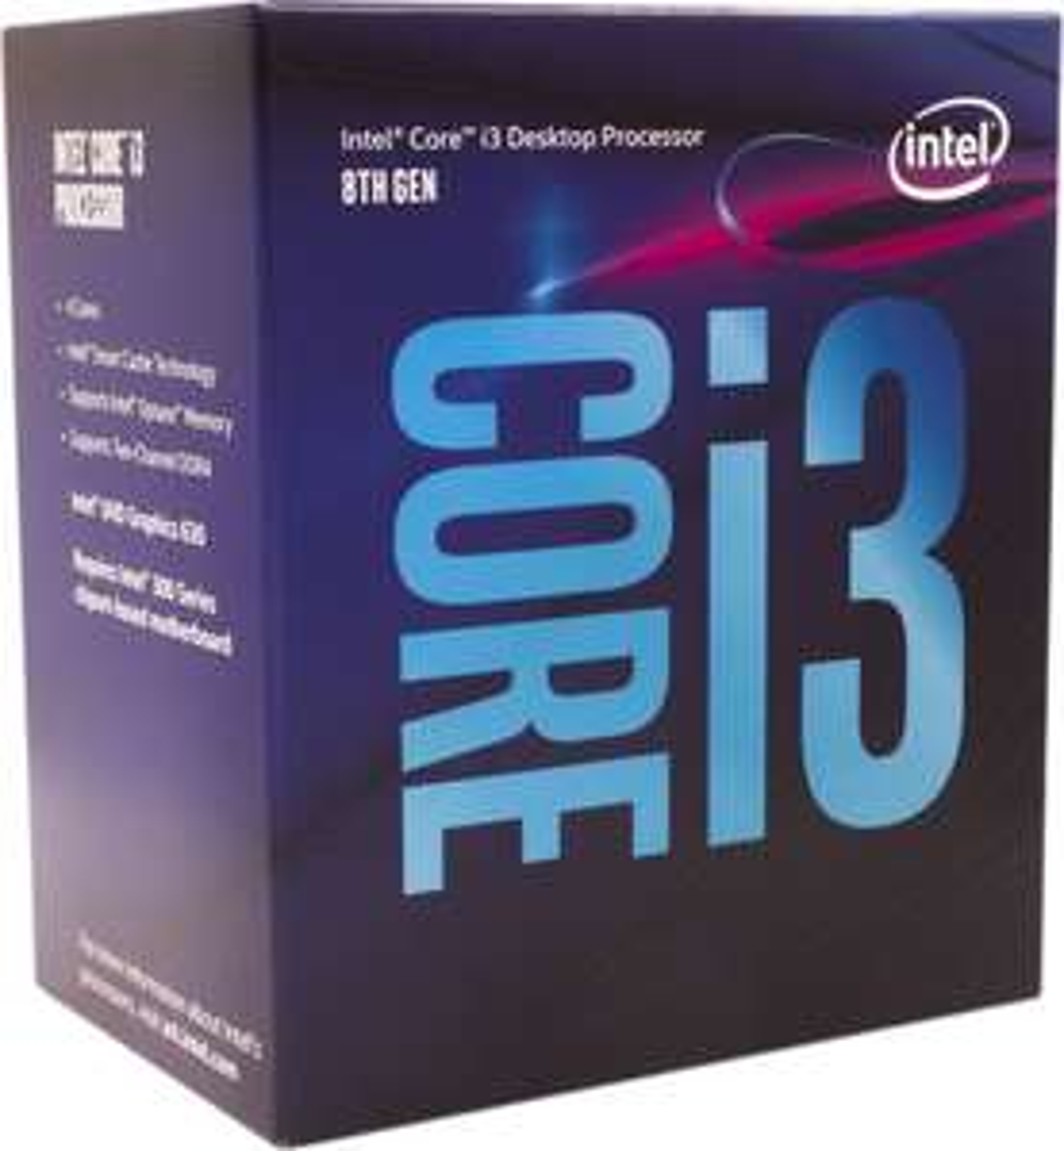 Procesor Intel Core i3-8100, 3.60GHz, 6MB, BOX (BX80684I38100)